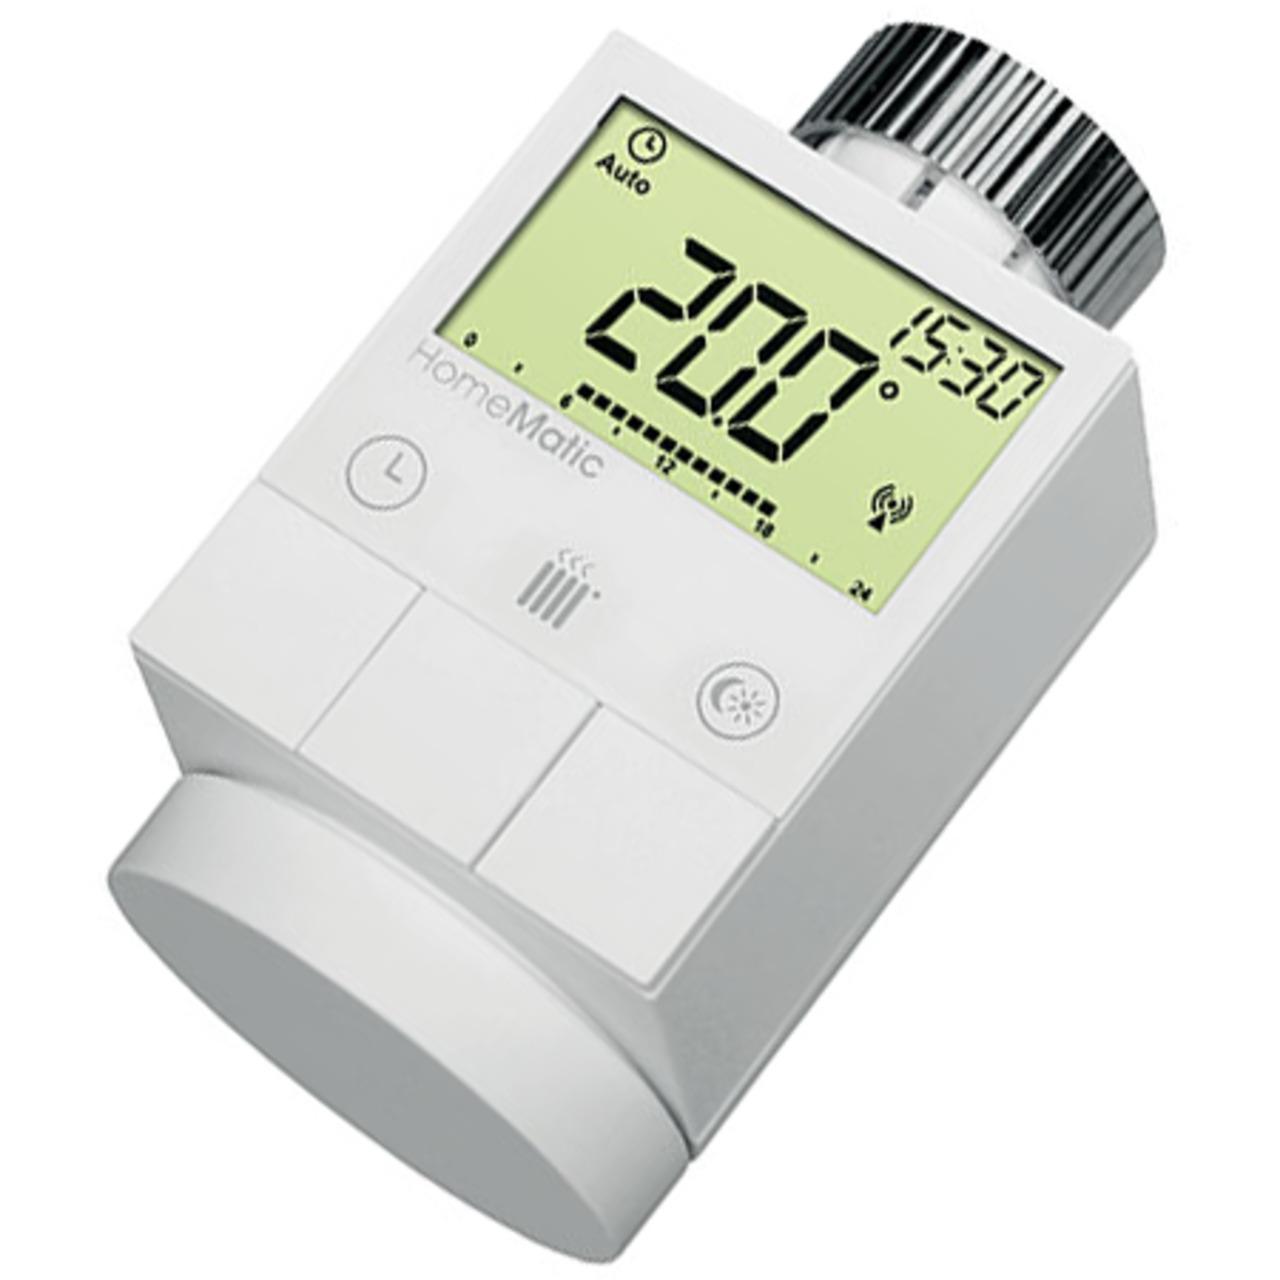 Homematic Funk-Heizkörperthermostat HM-CC-RT-DN für Smart Home - Hausautomation